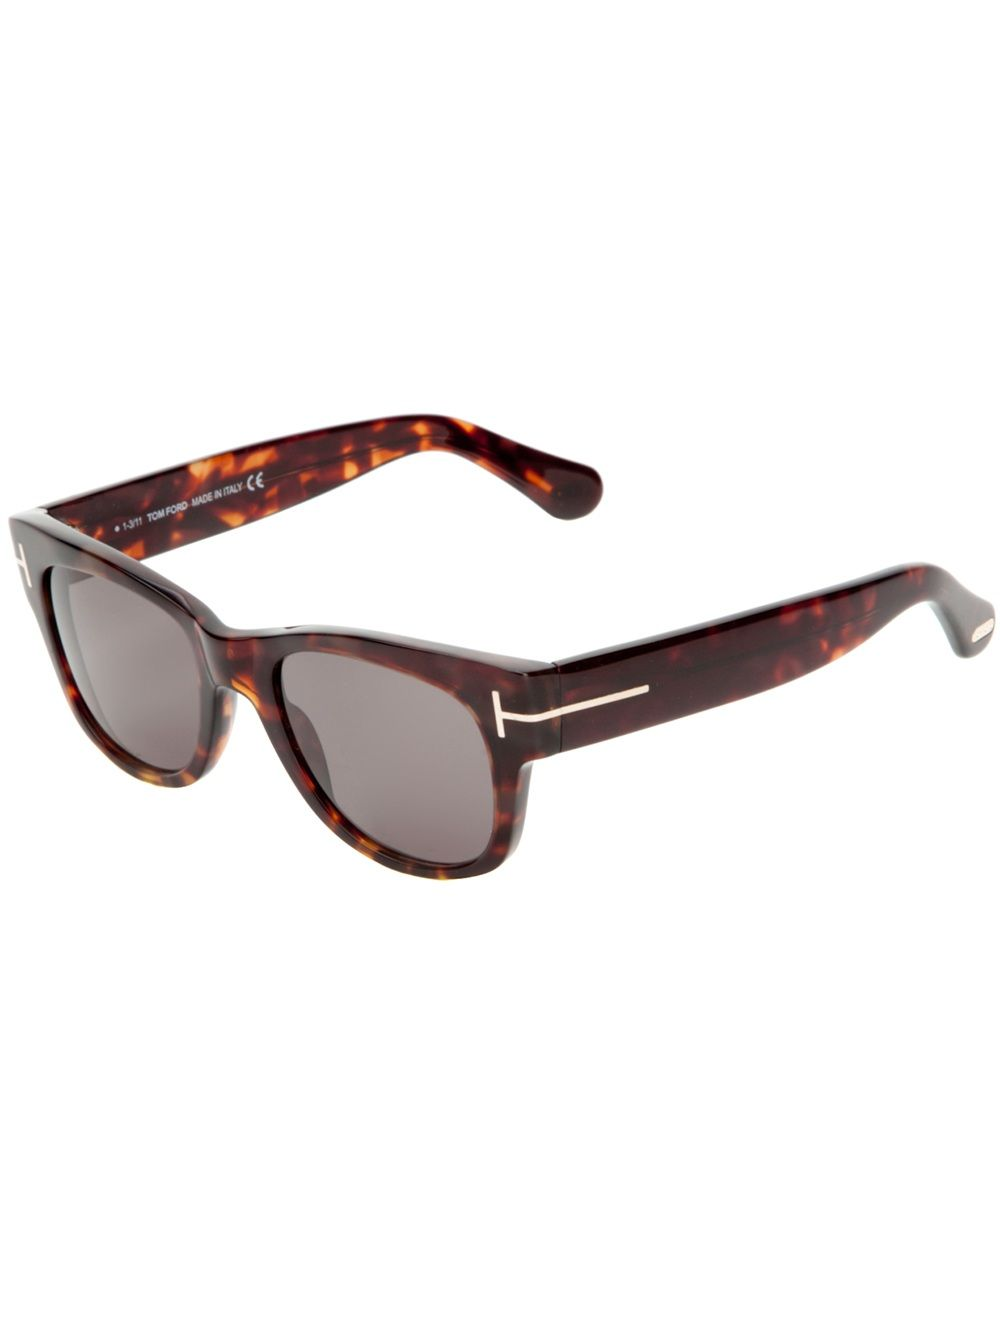 8498fae7a02 tom ford cary sunglasses. tom ford cary sunglasses Round Frame ...